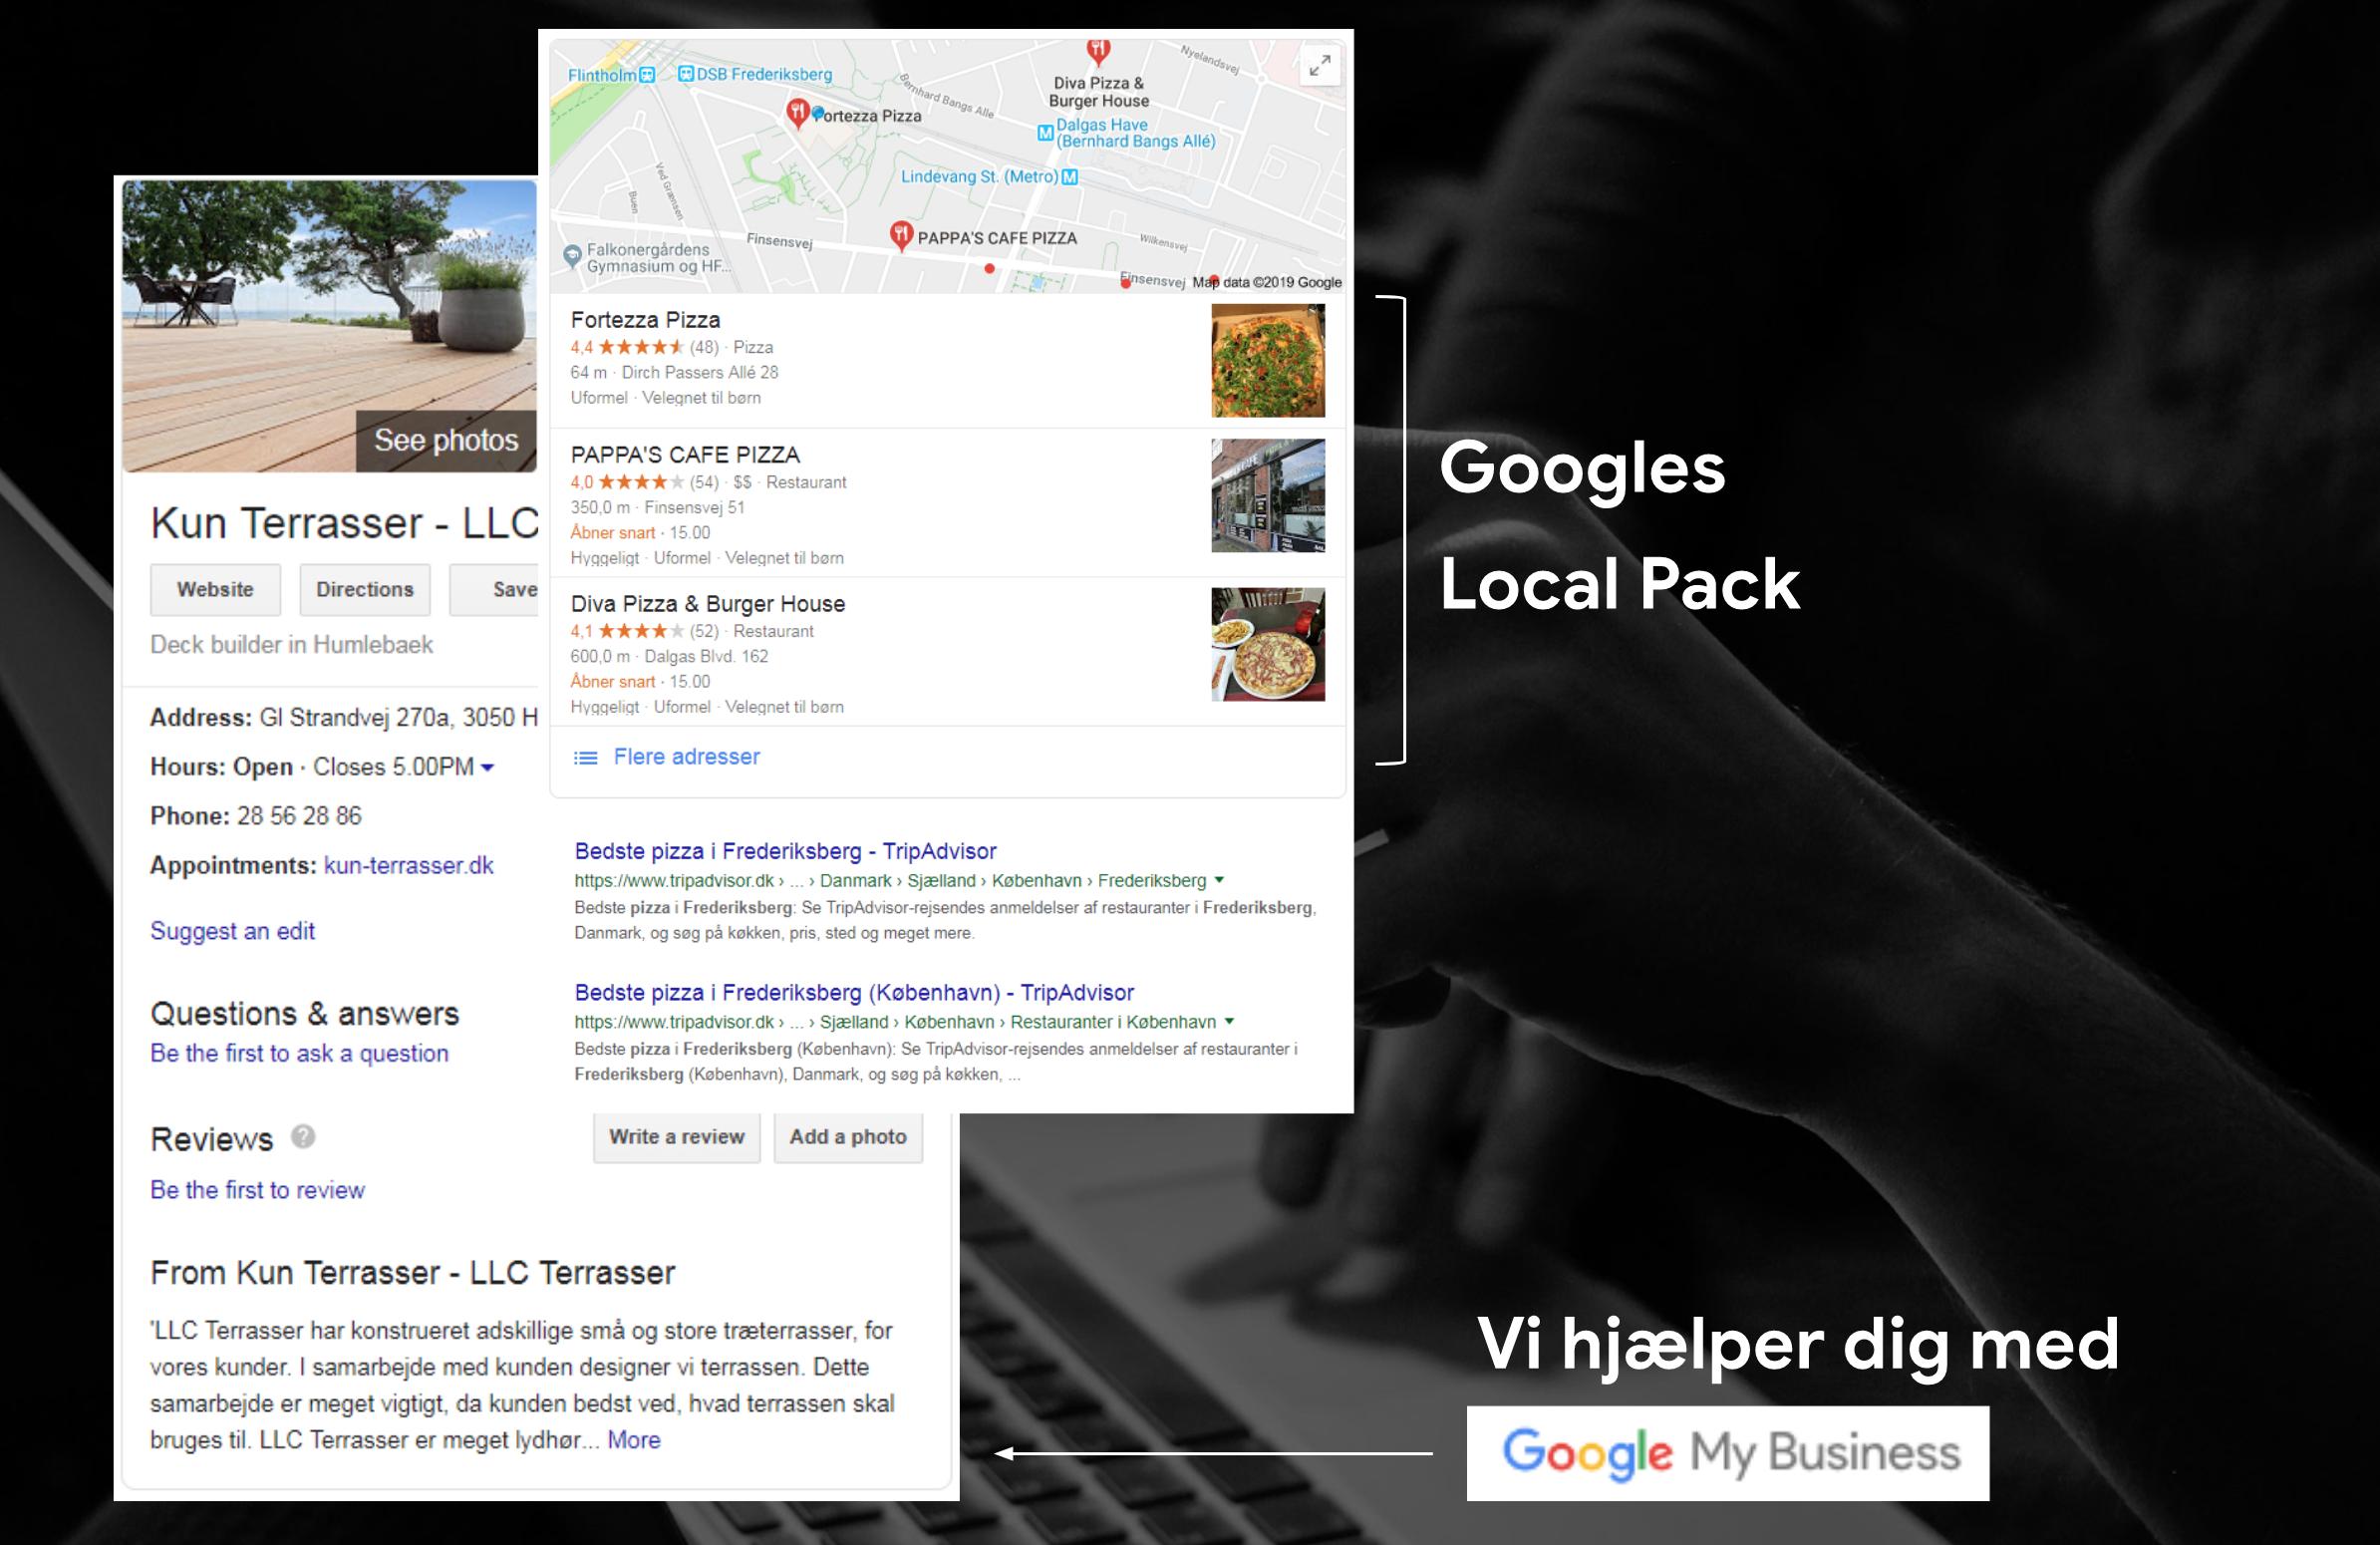 Google My Business og Googles Local Pack